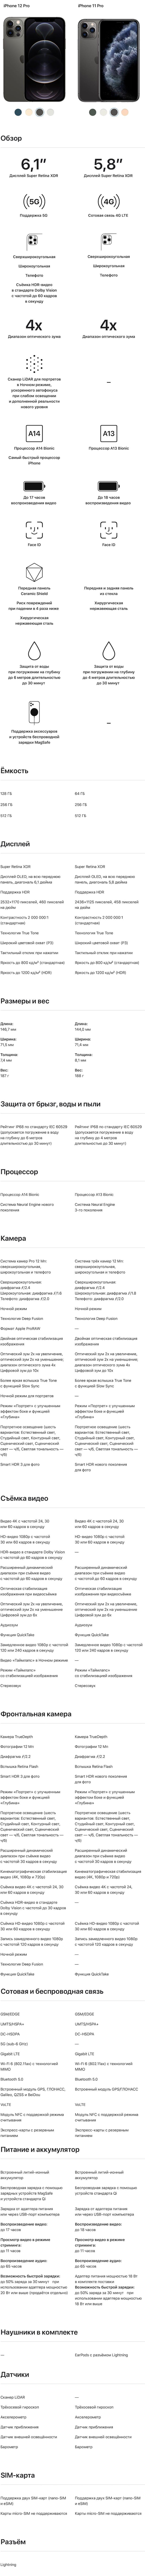 Подробное сравнение технических характеристик (спецификаций)iPhone 12 Pro и iPhone 11 Pro